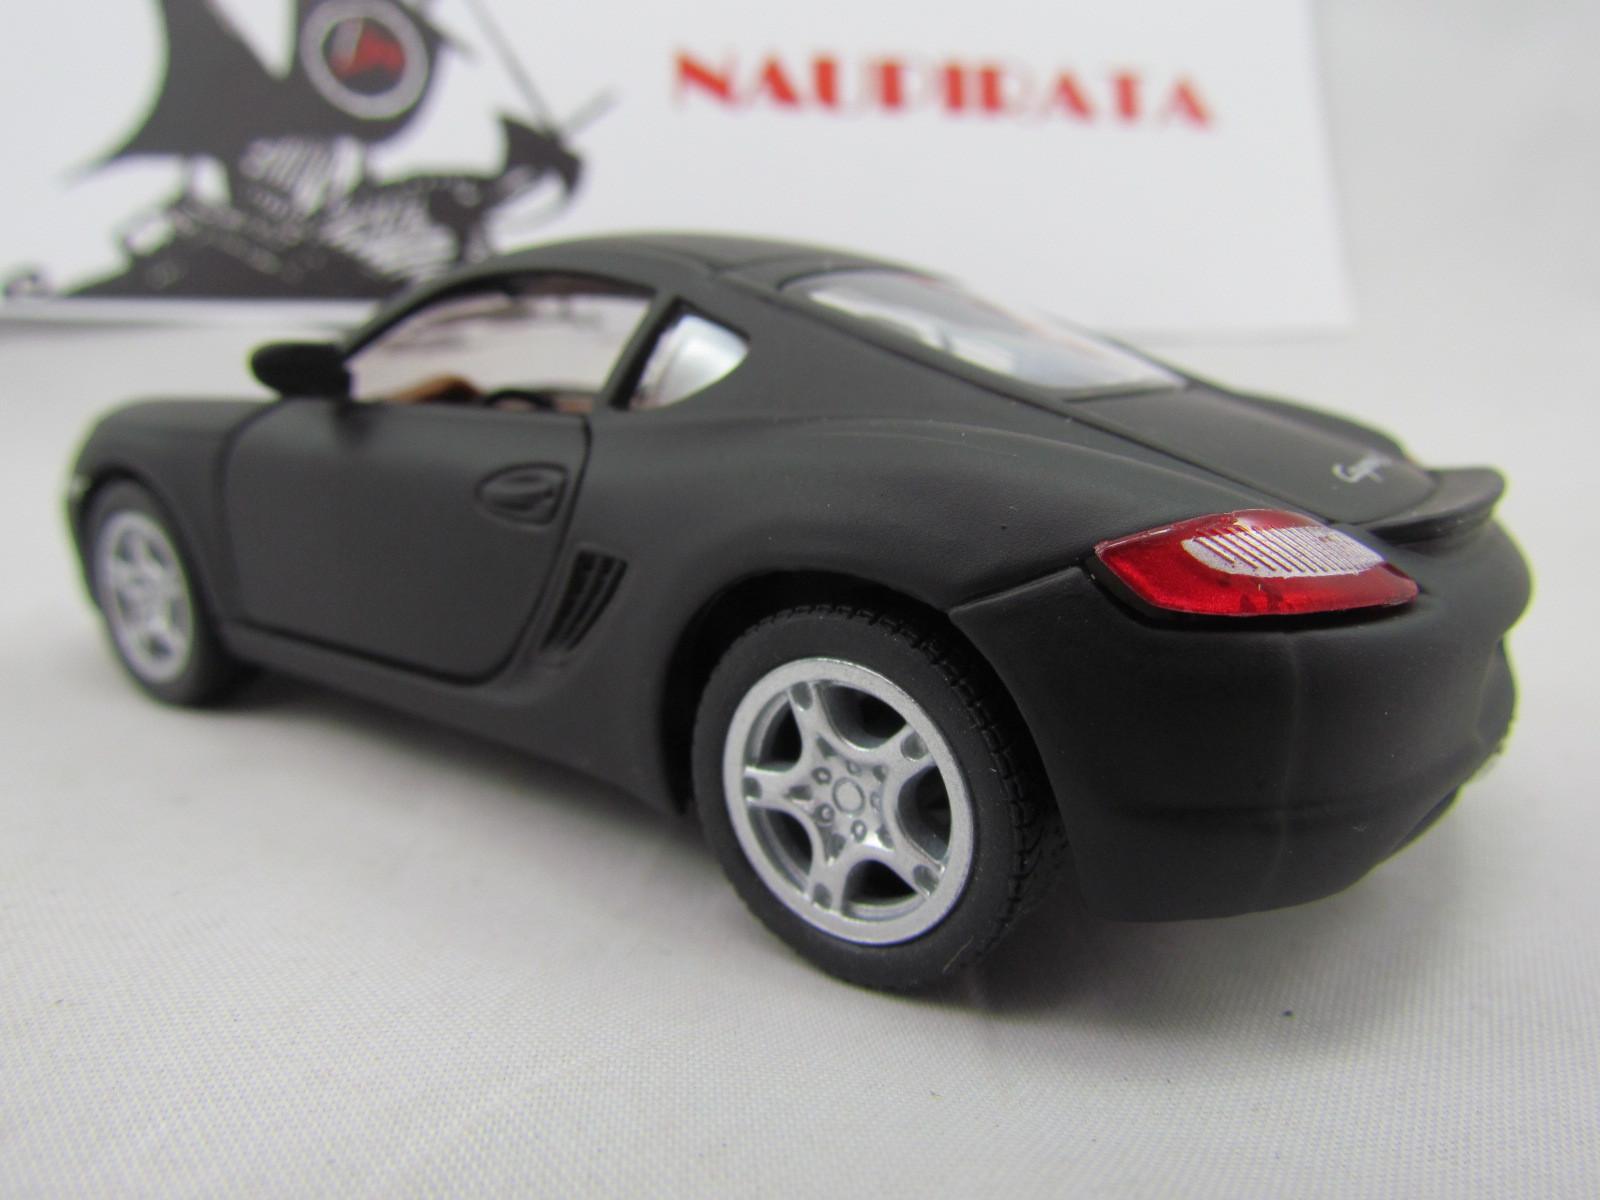 Porsche (Matte) Cayman S Preto Fosco Kinsmart 1:34